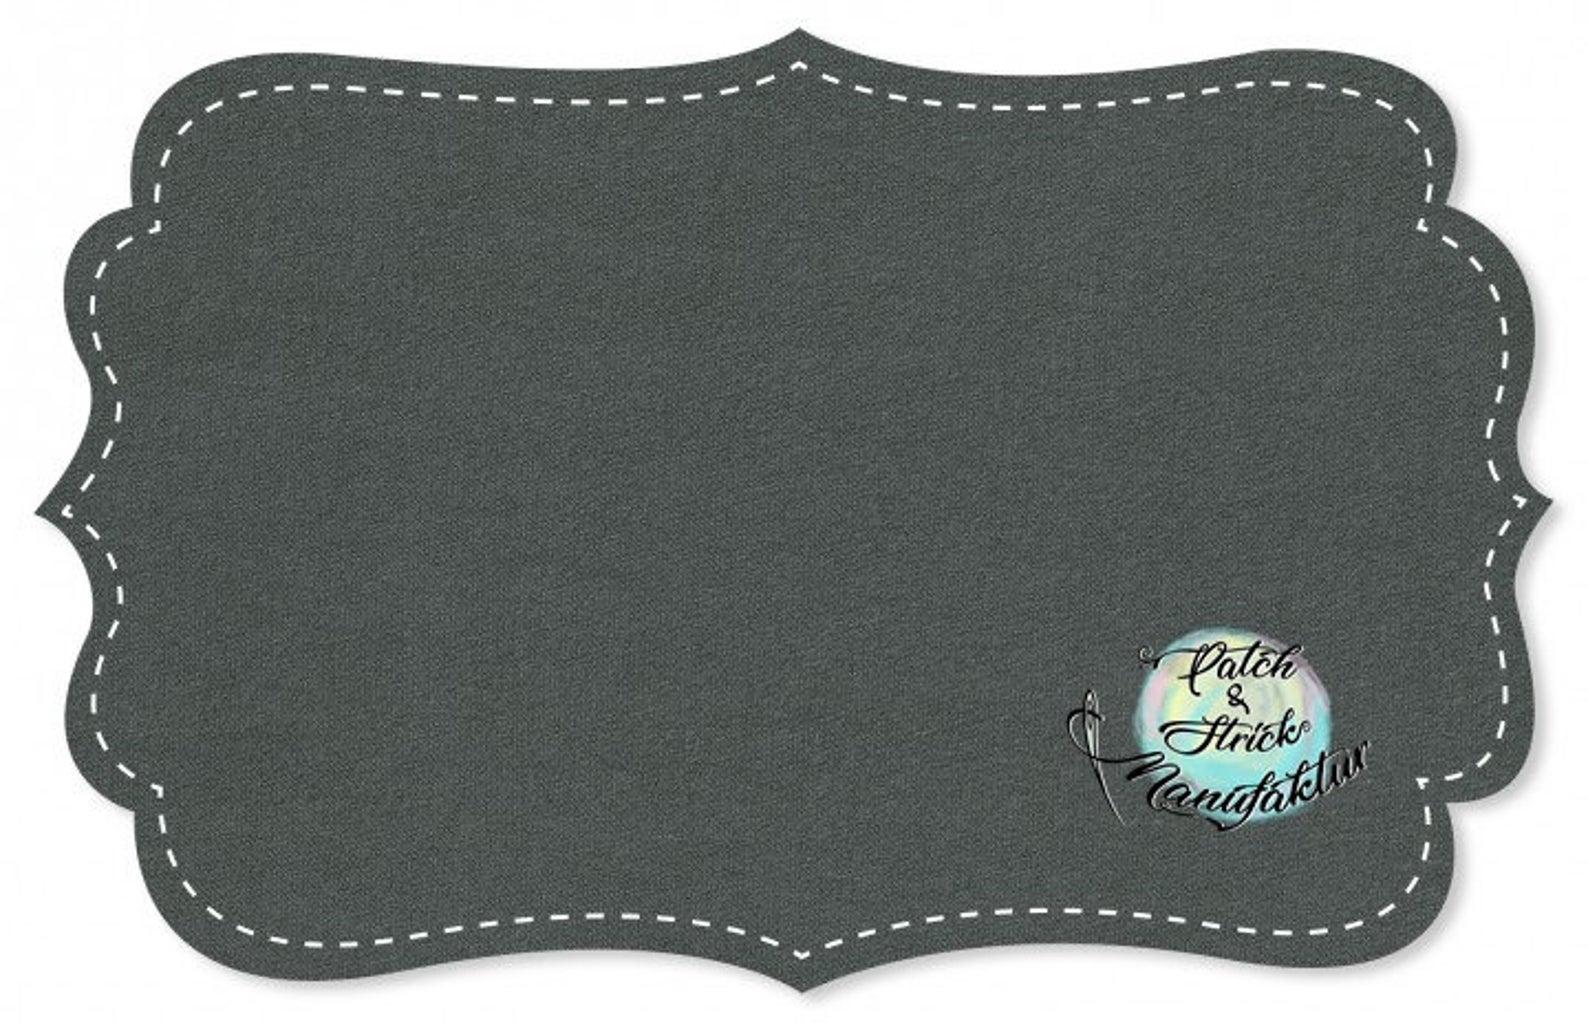 Blauband Stoffpaket Wale Ohne Ebook 5